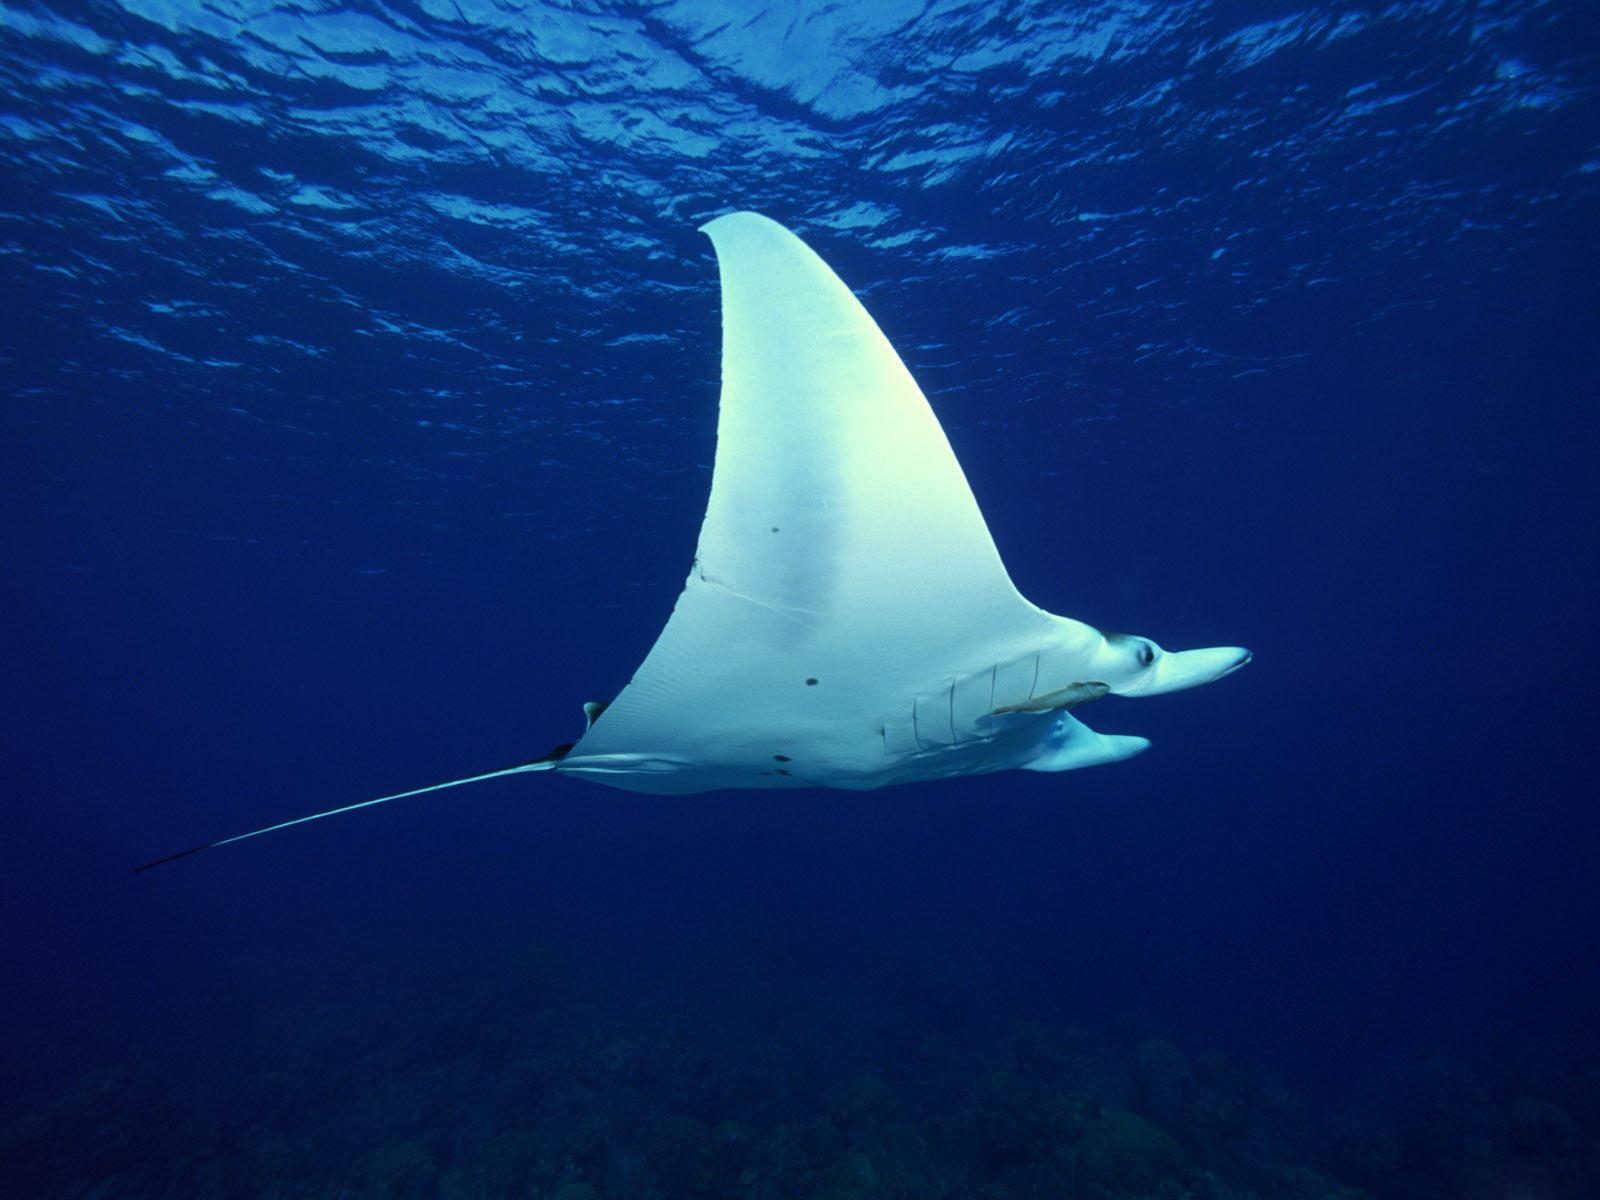 Free Cool Wallpapers: underwater hd